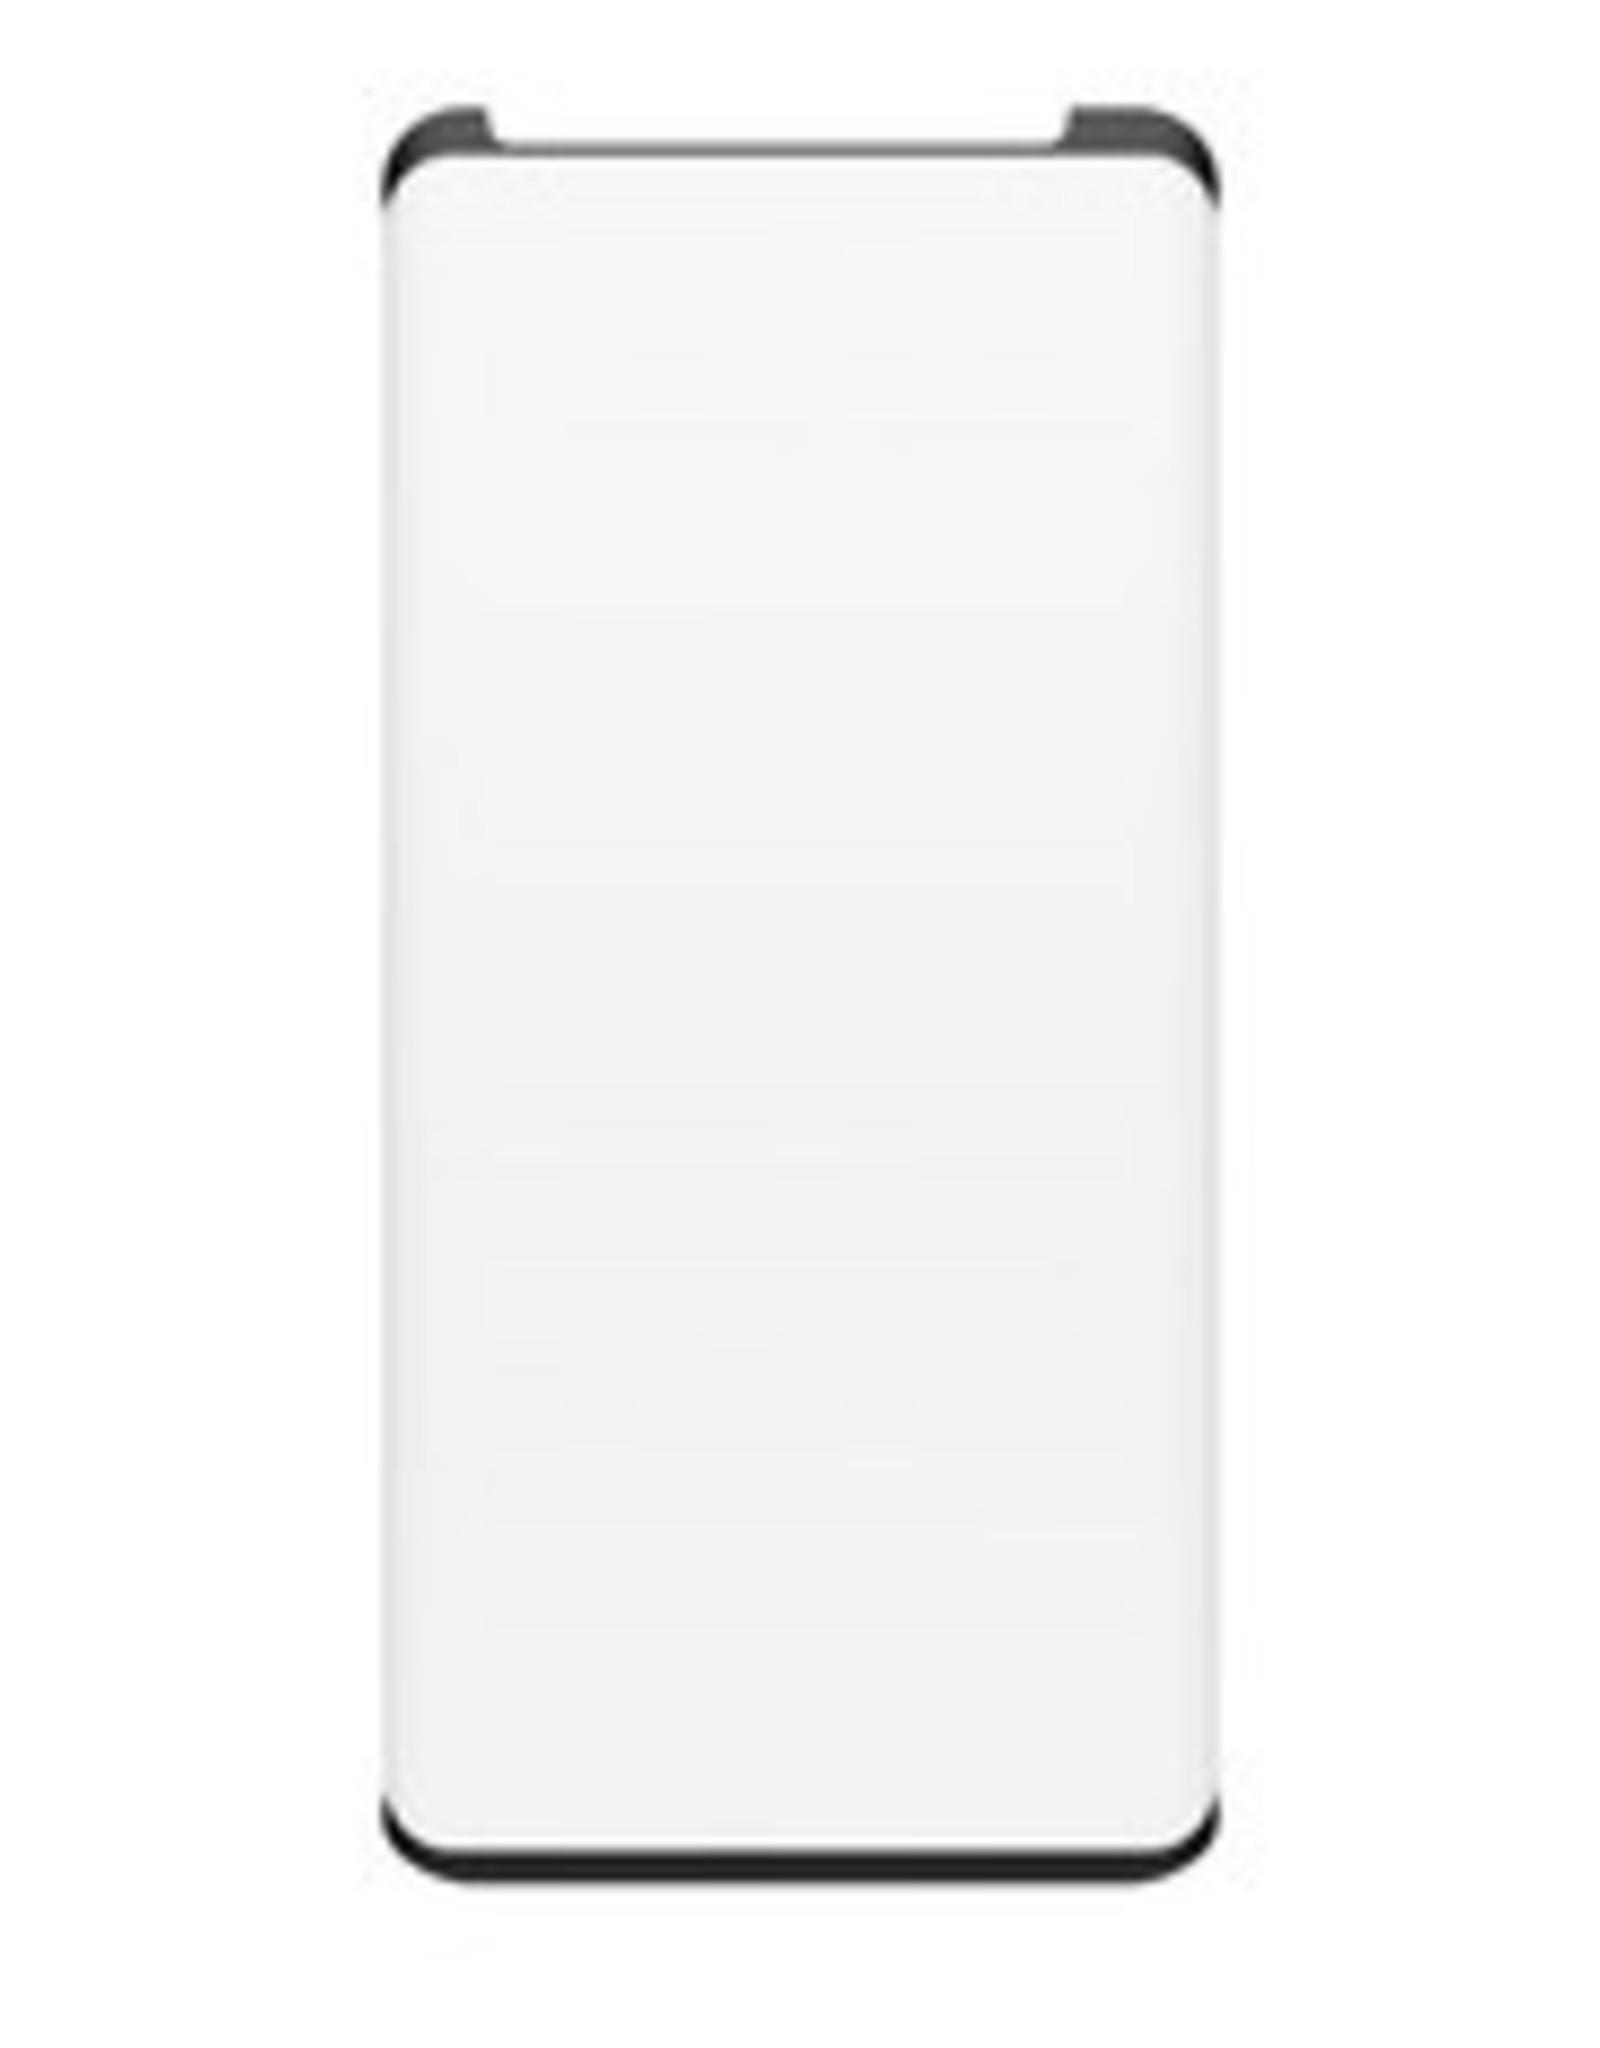 Caseco /// Caseco Screenflex - Flexible Glass Screen Protector - Samsung Galaxy S10 Plus C4311-00